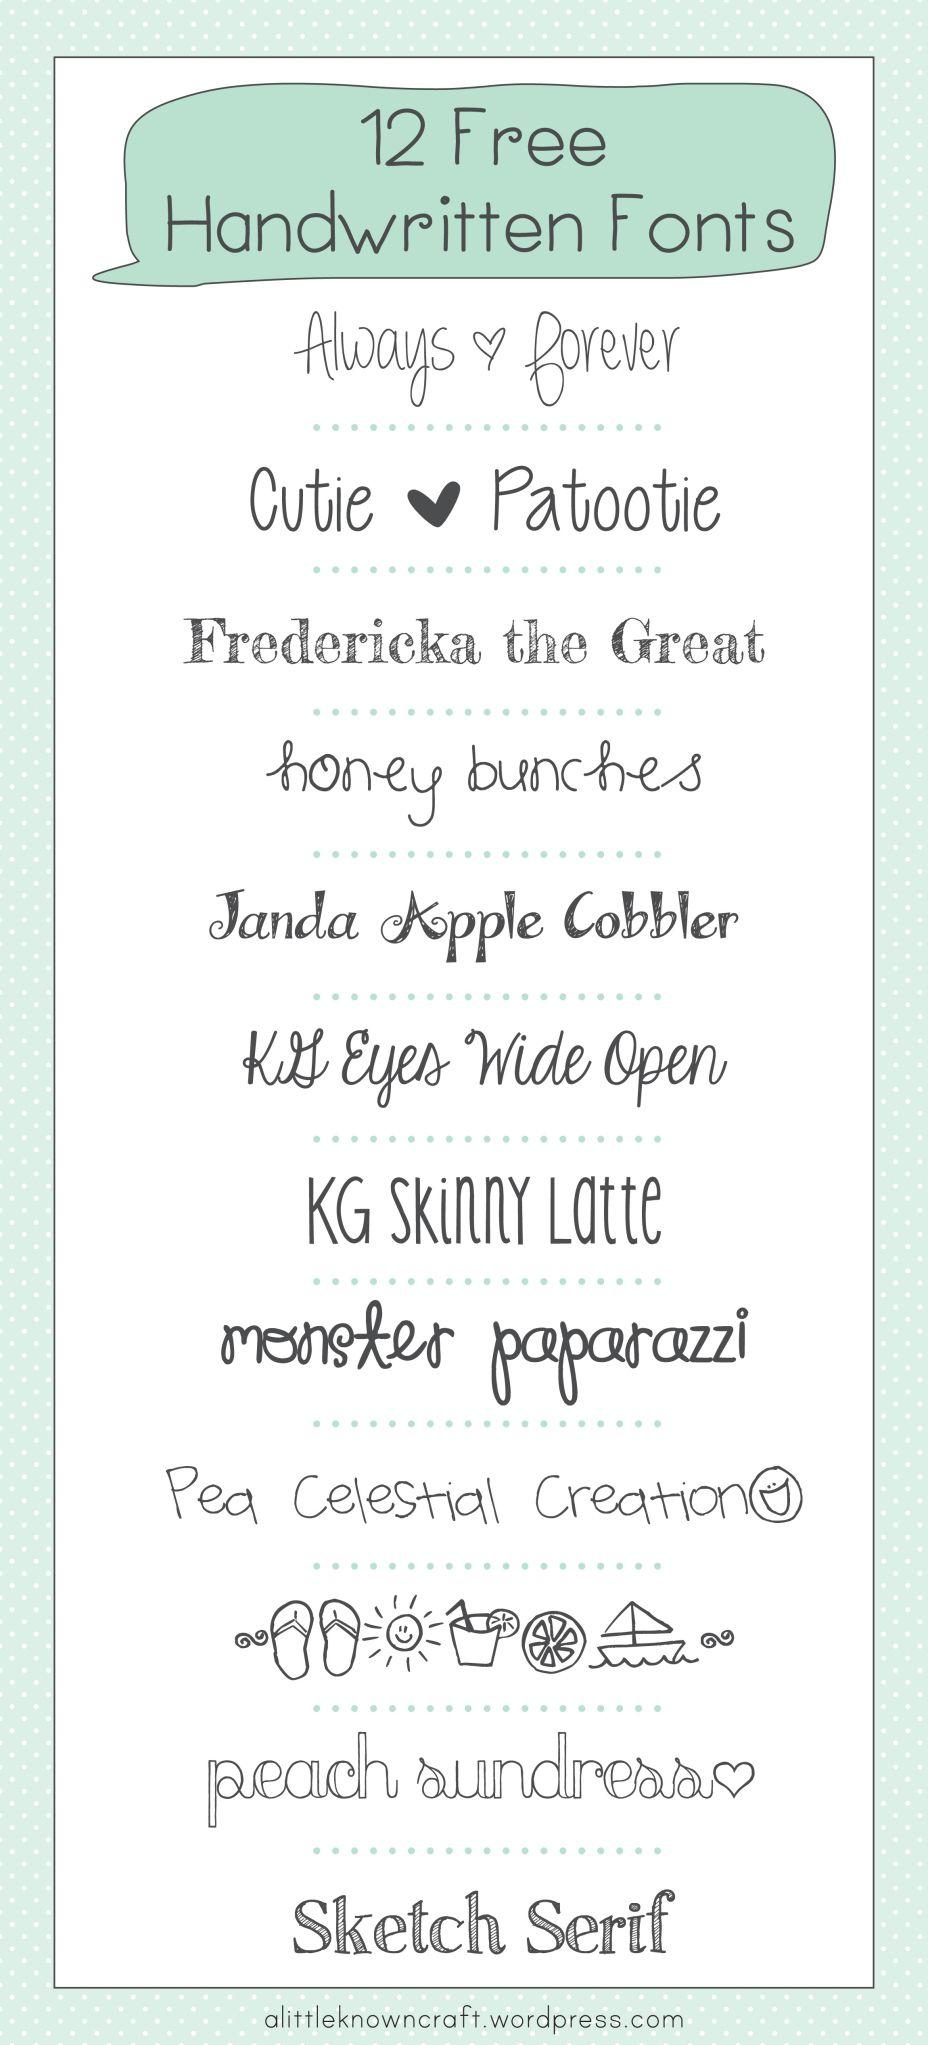 12 Free Handwritten Fonts Free handwritten fonts